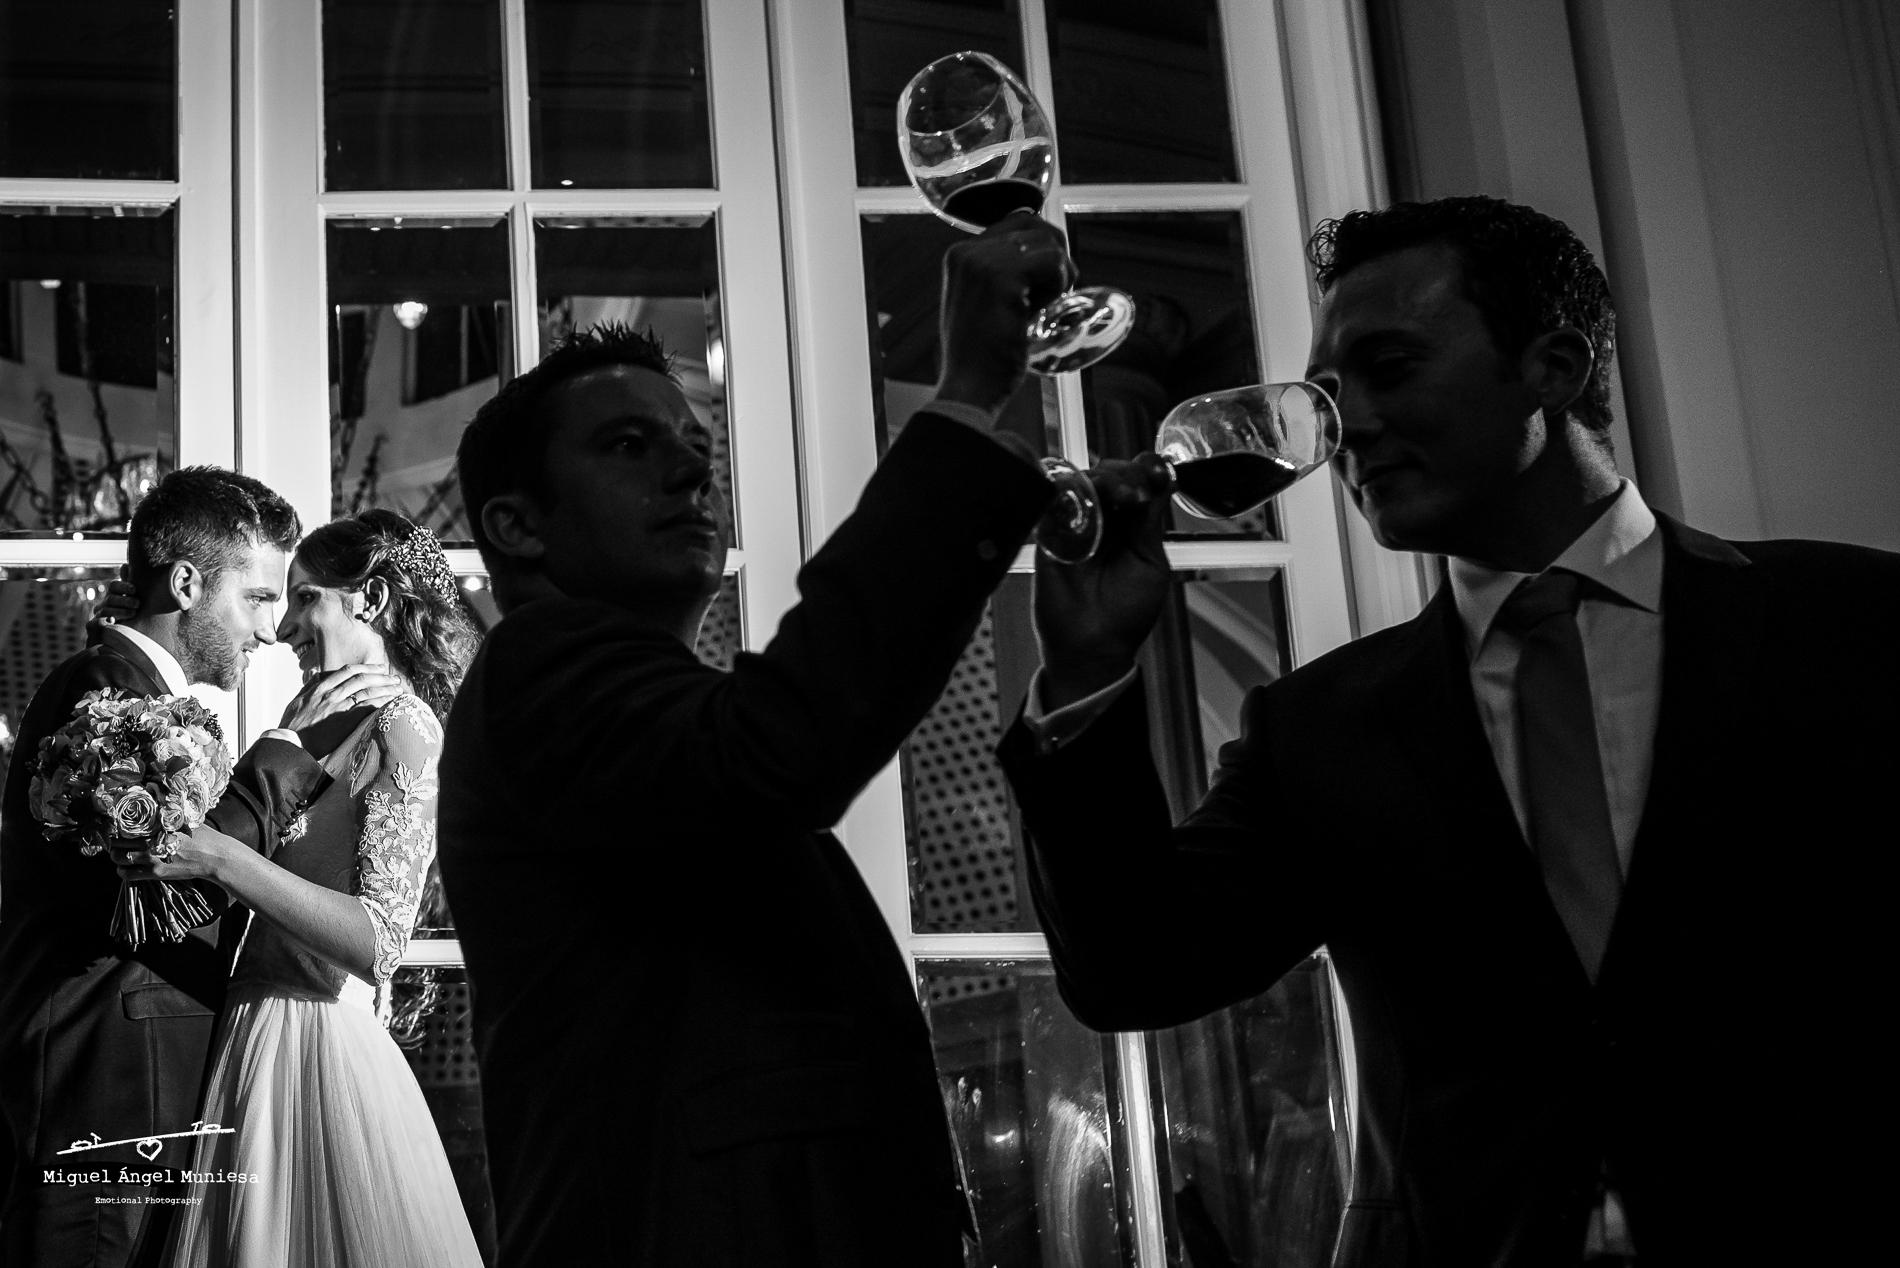 miguel angel muniesa, fotografo boda Teruel, fotografo boda navarra, fotografo boda zaragoza, fotografo boda soria, miguel angel muniesa emotional photography_21